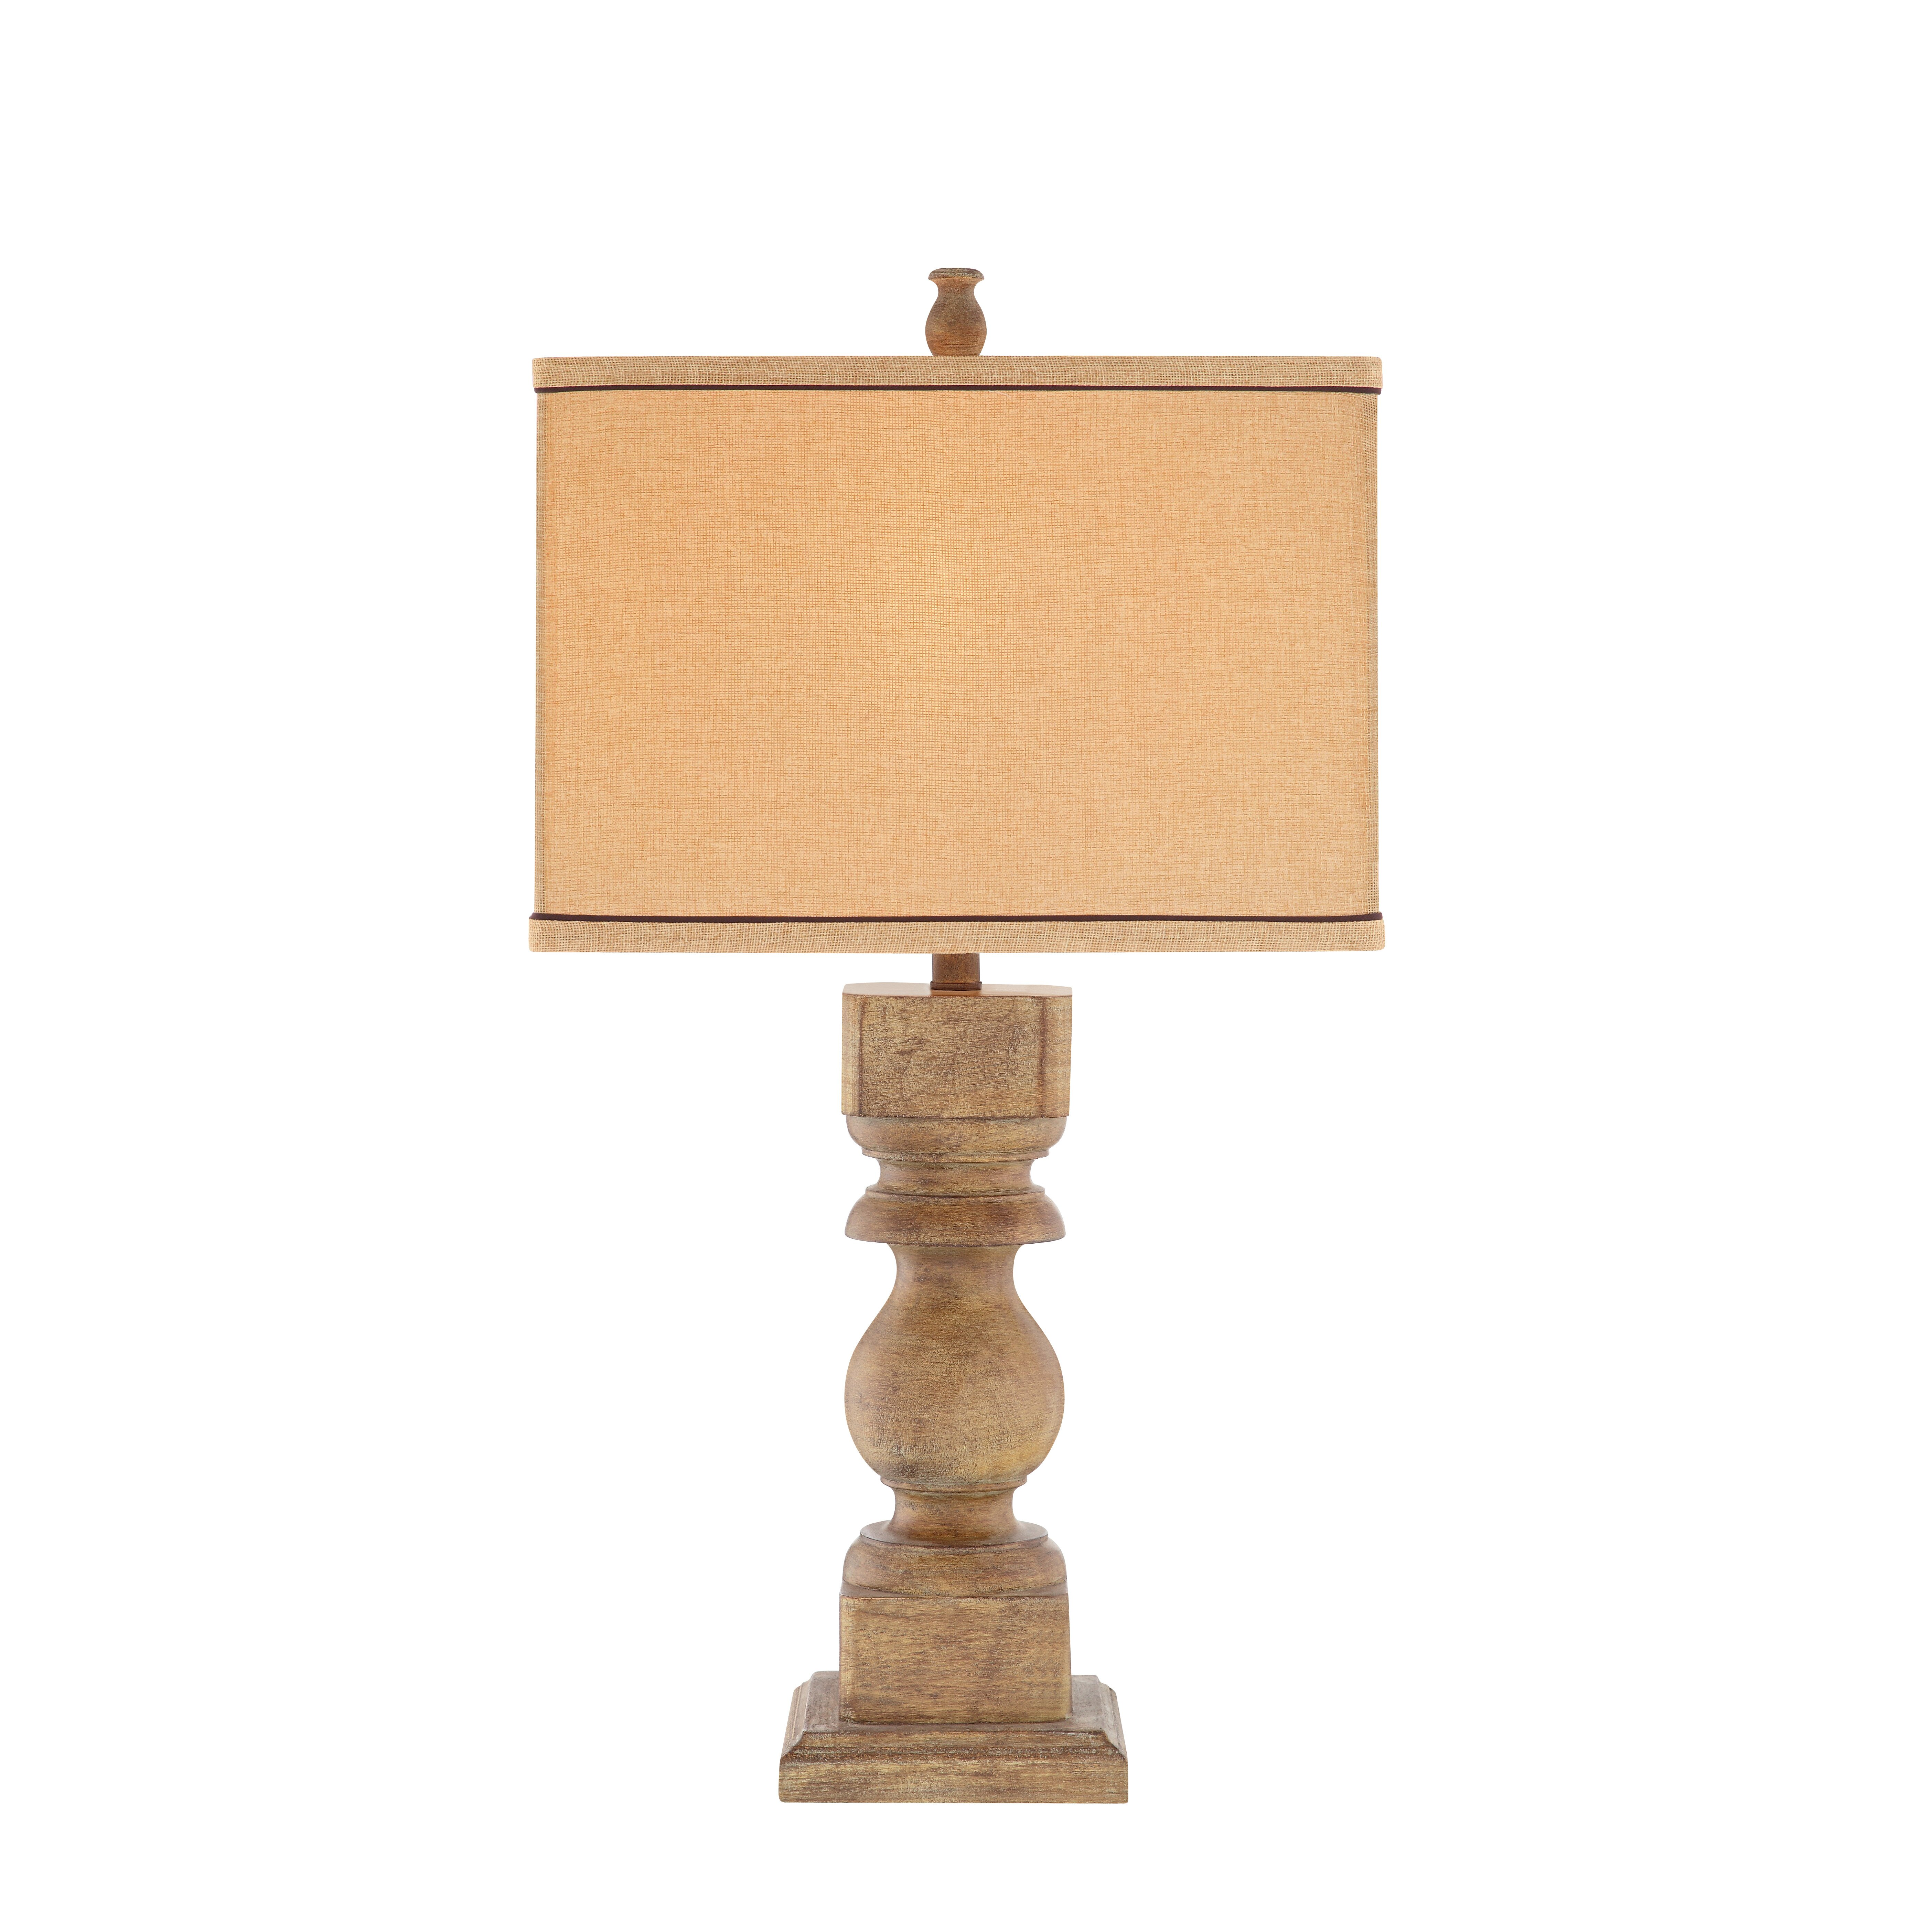 catalina lighting 30 h table lamp reviews wayfair. Black Bedroom Furniture Sets. Home Design Ideas